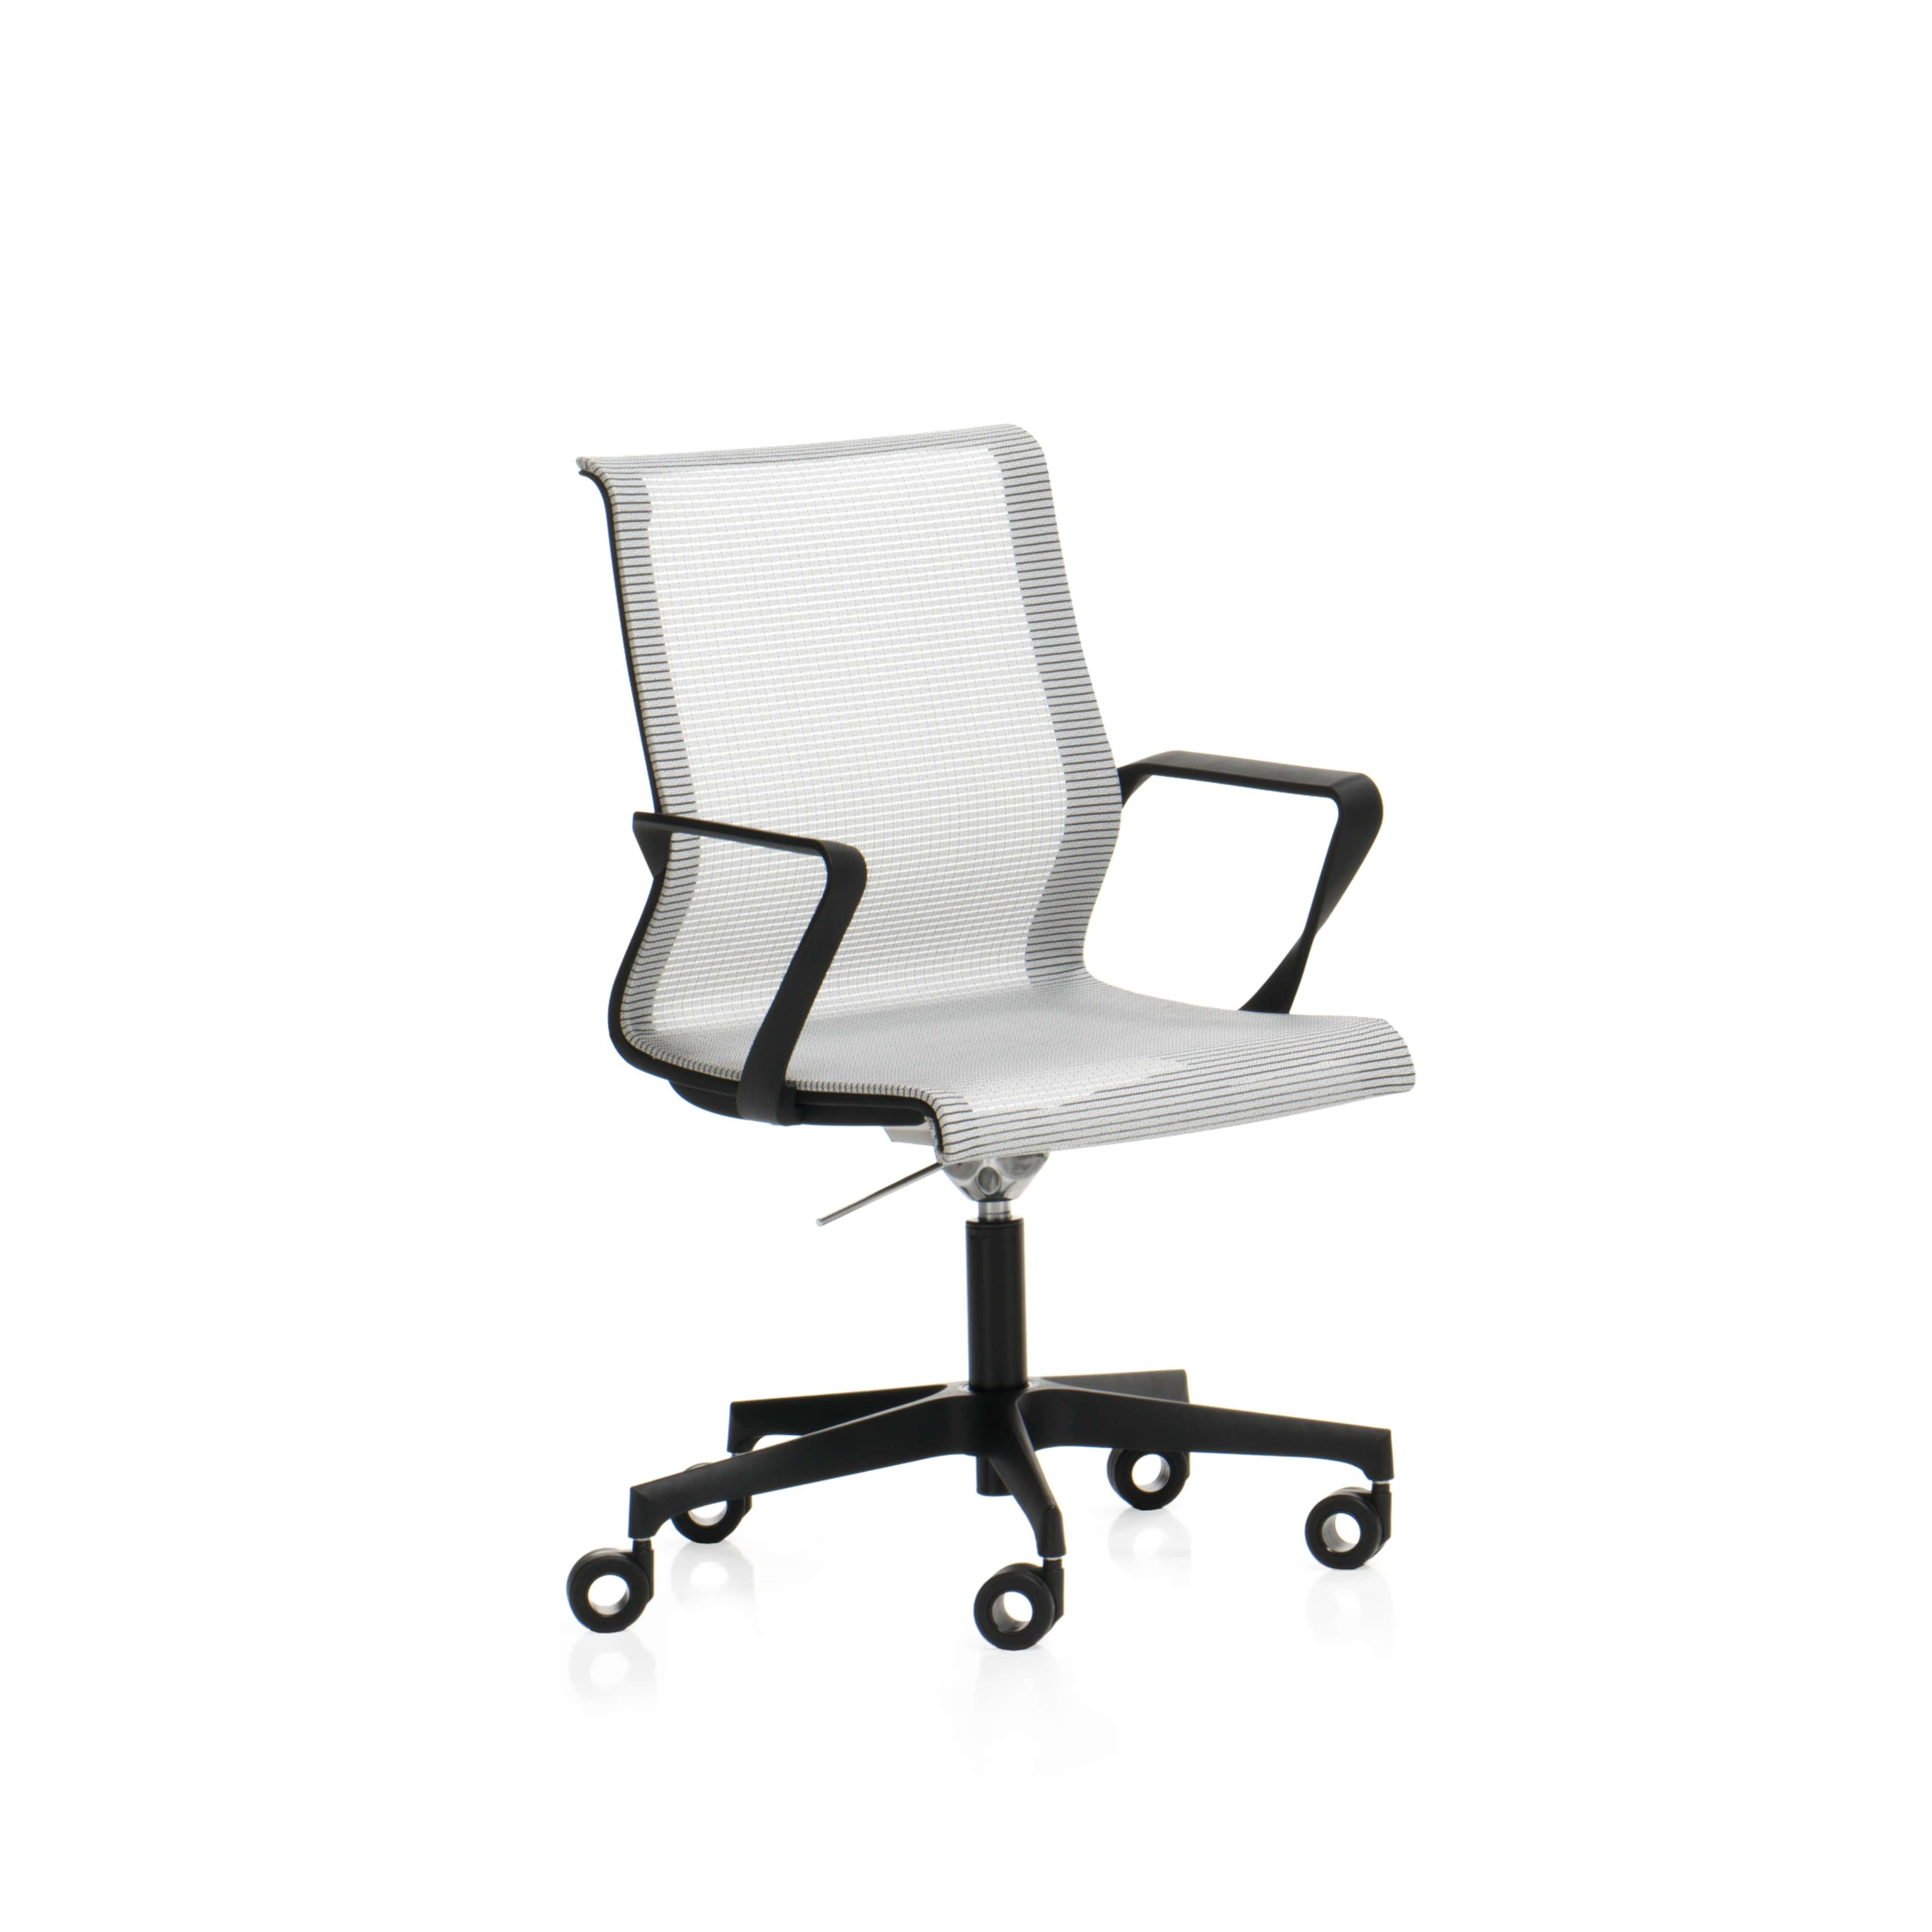 sillas-oficina-General-muebles-paco-caballero-454-5caf5d9e30359